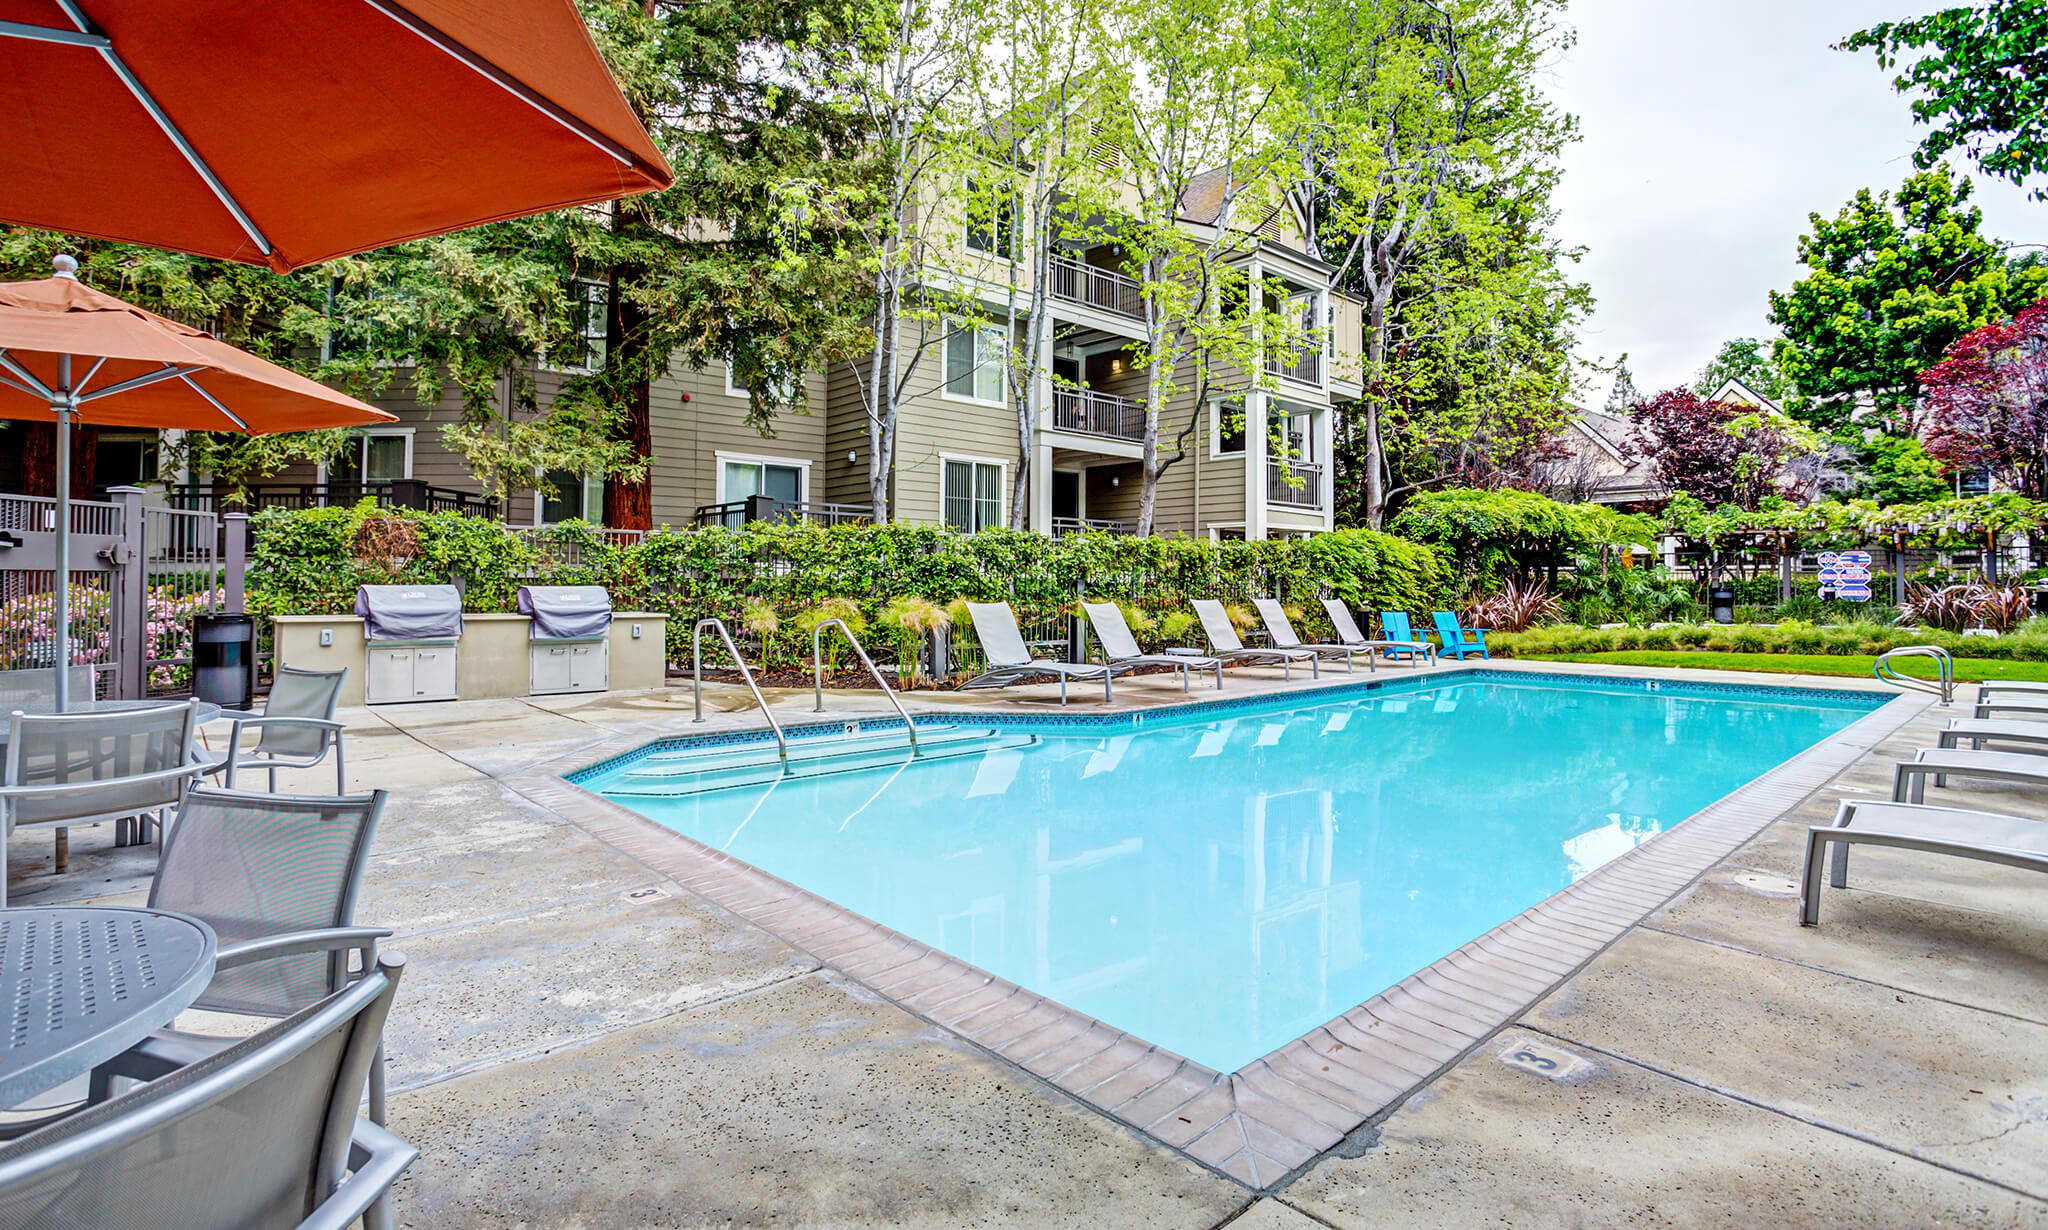 Park Central Apartments apartments in Santa Clara CA to rent photo 1